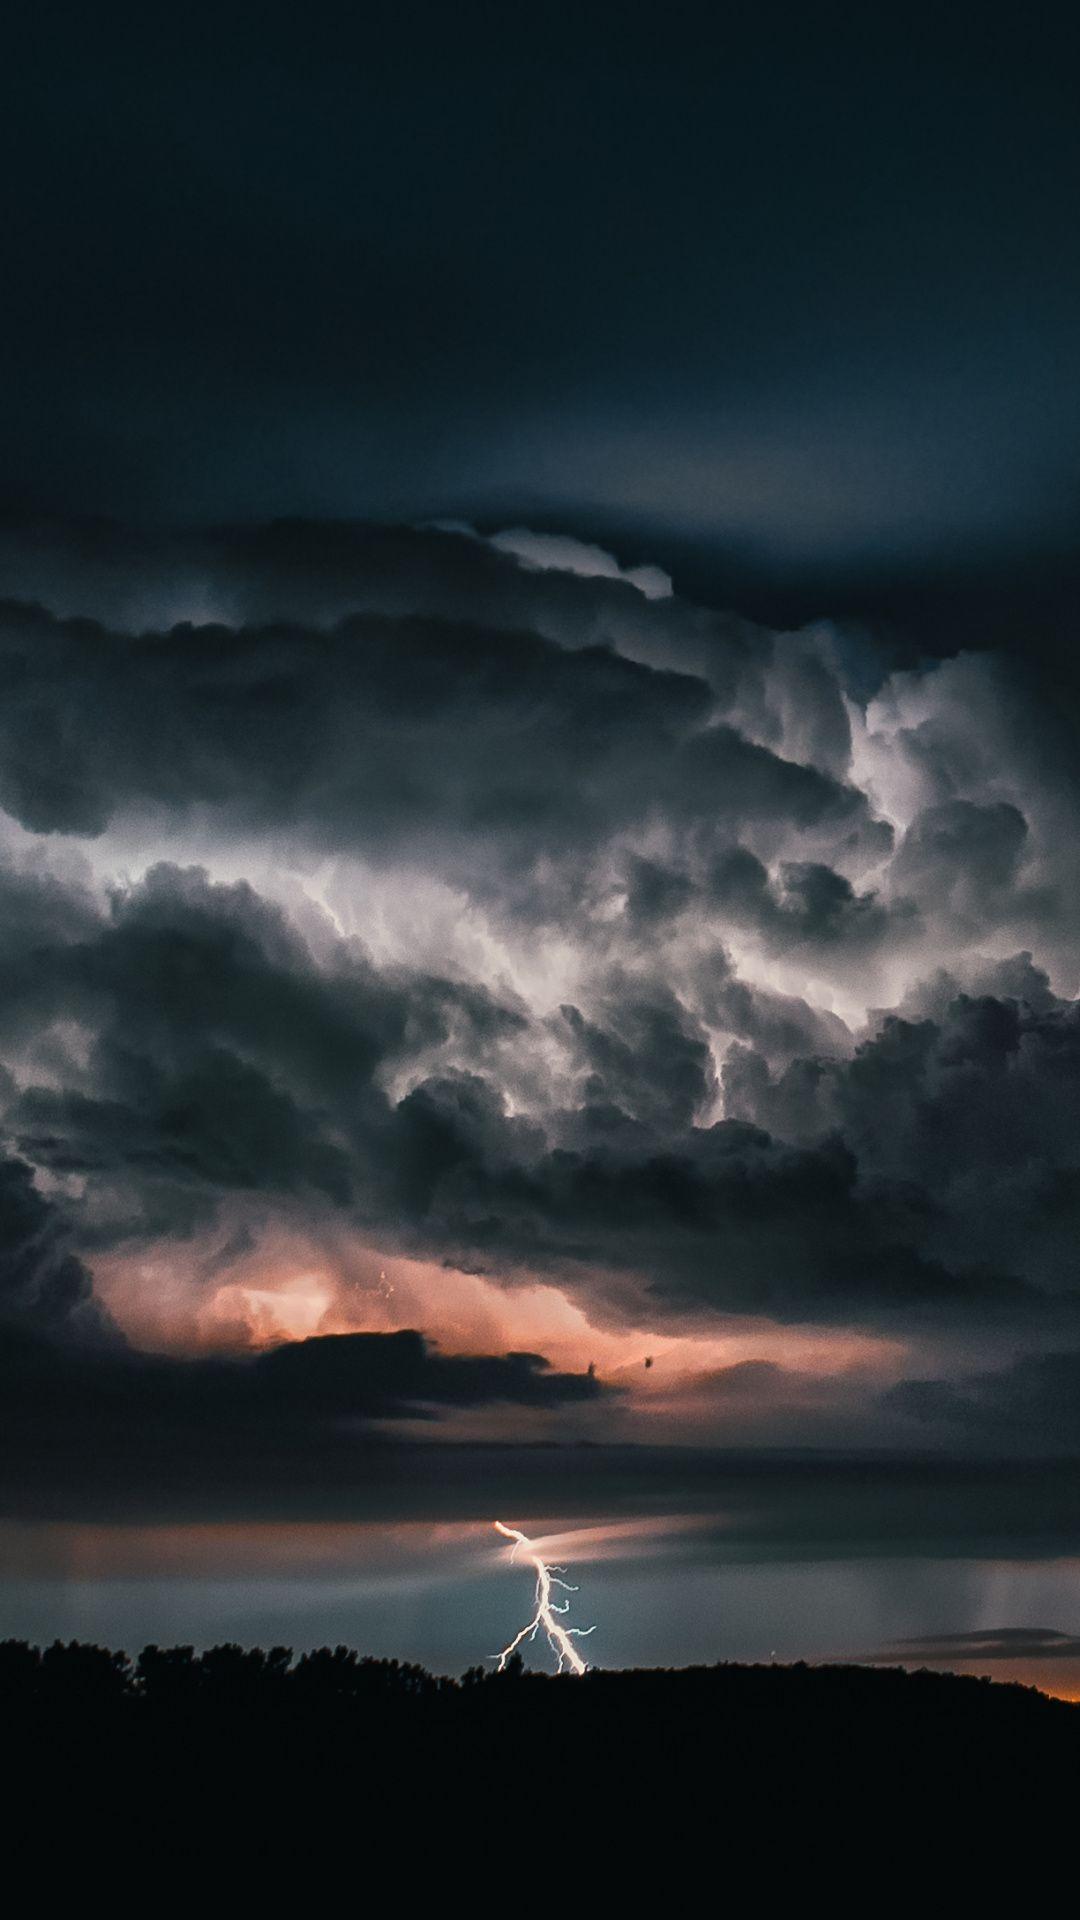 Lightning, thunderstorm, cloudy, sky, 1080x1920 wallpaper